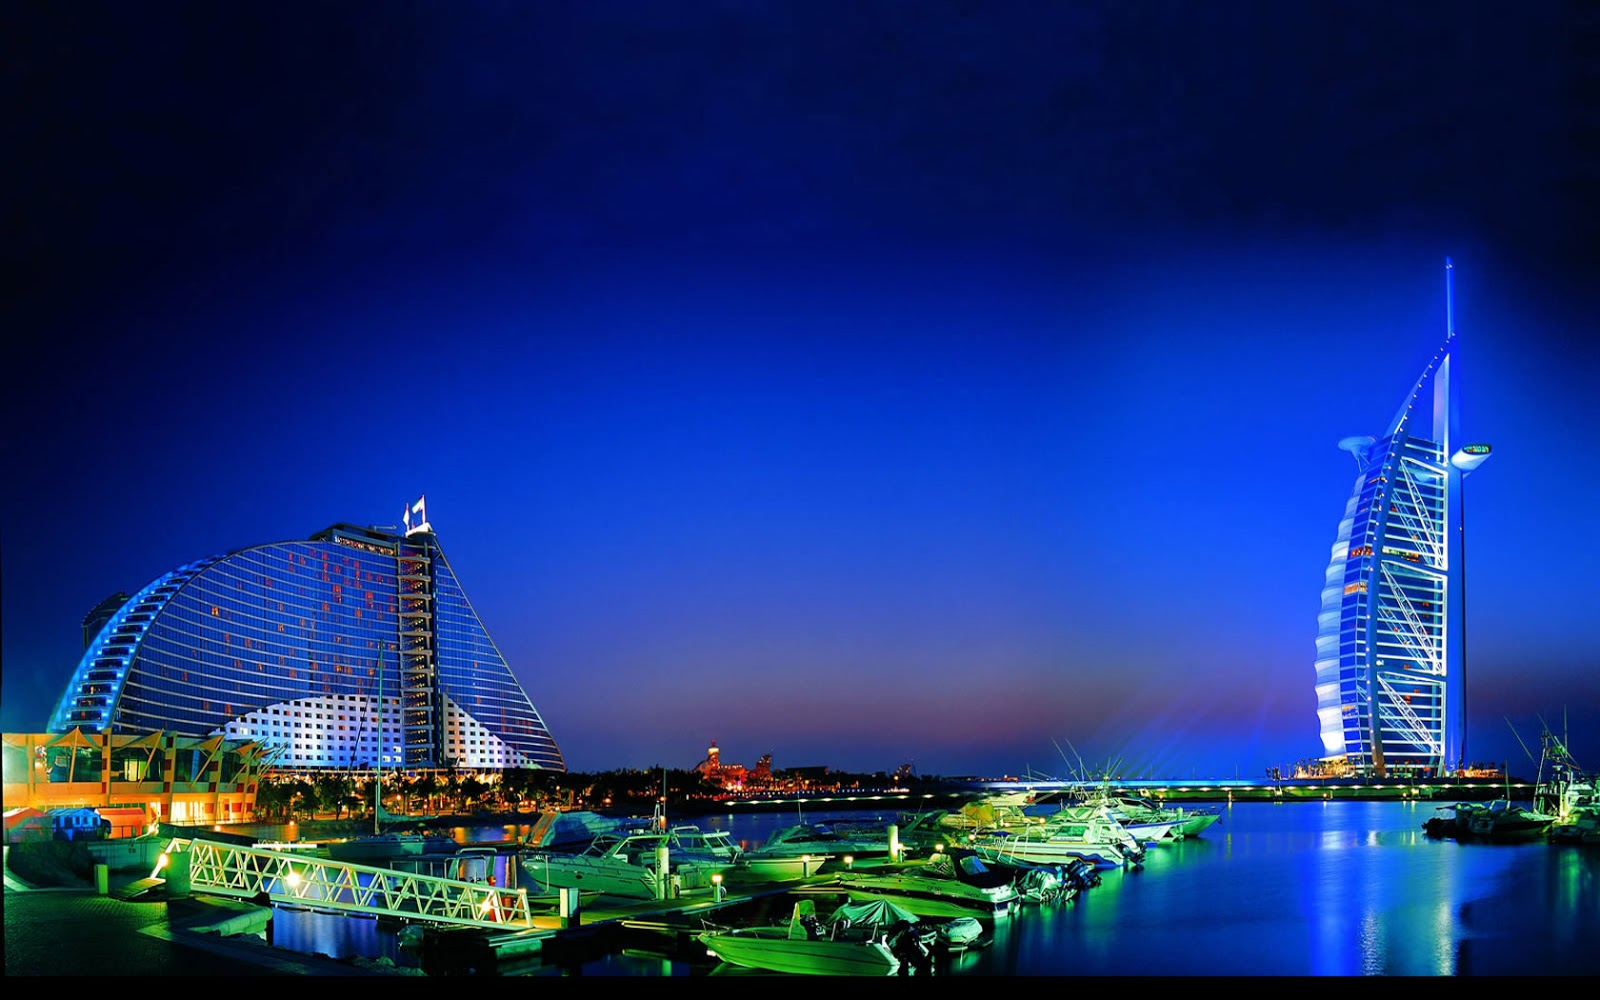 Luxury Life Design: The World's Only 7-Star Hotel - Burj Al Arab by Jumeirah